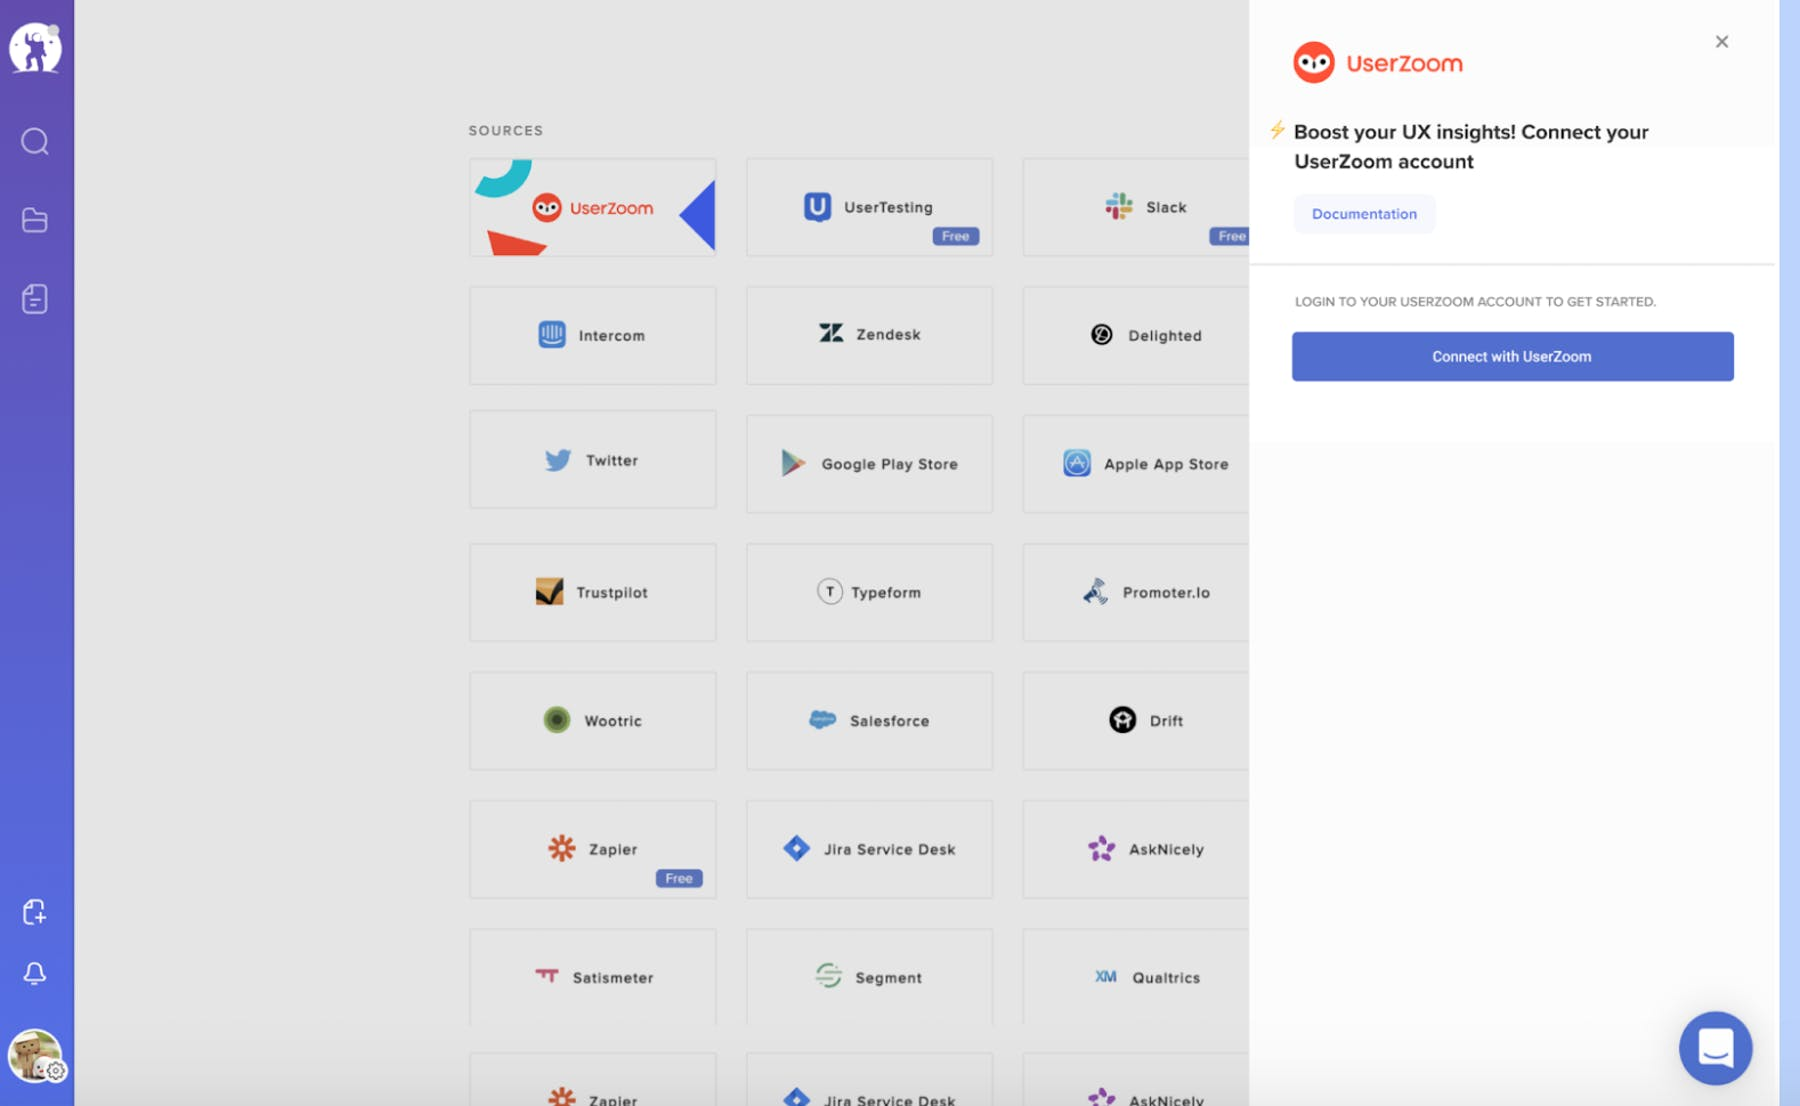 EnjoyHQ Integrations page